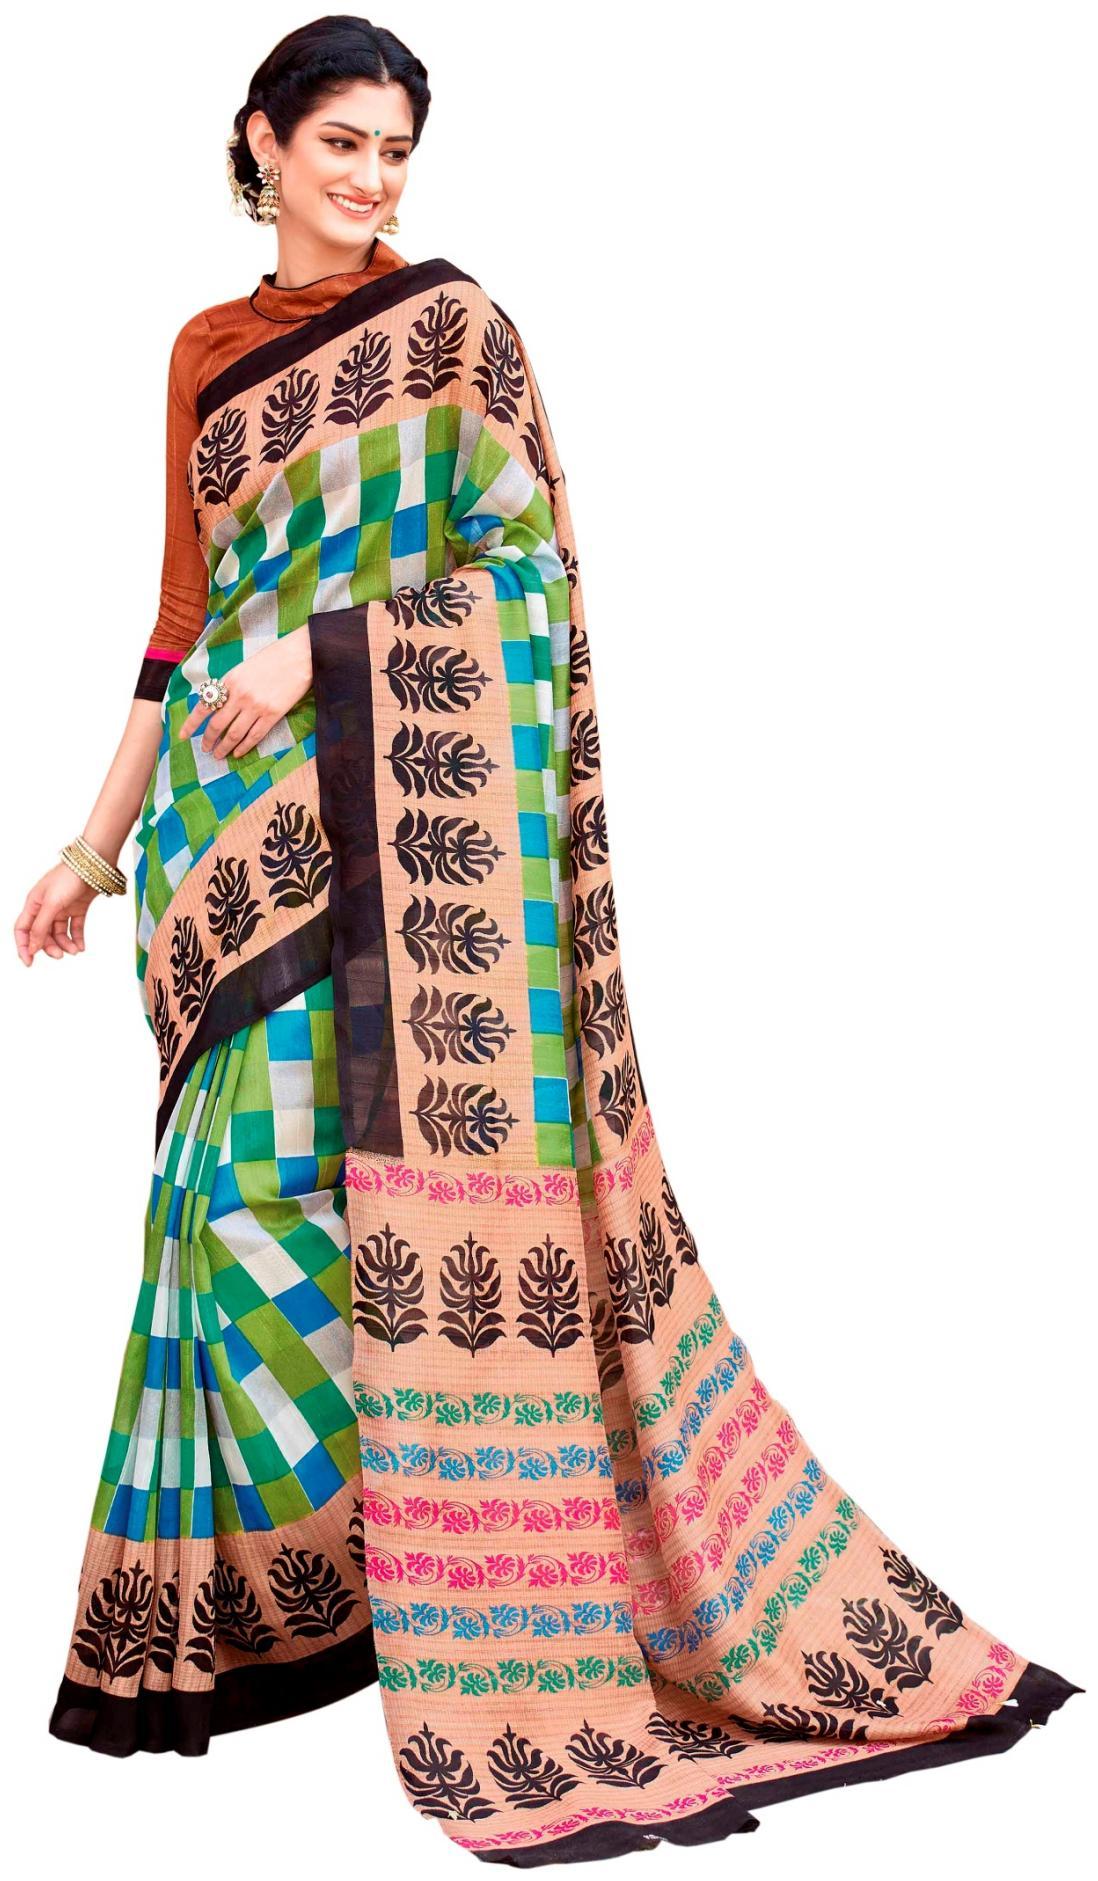 da1f573a9c4b2 Buy Varibha Universal Silk Casual Saree Yes at 86% off.